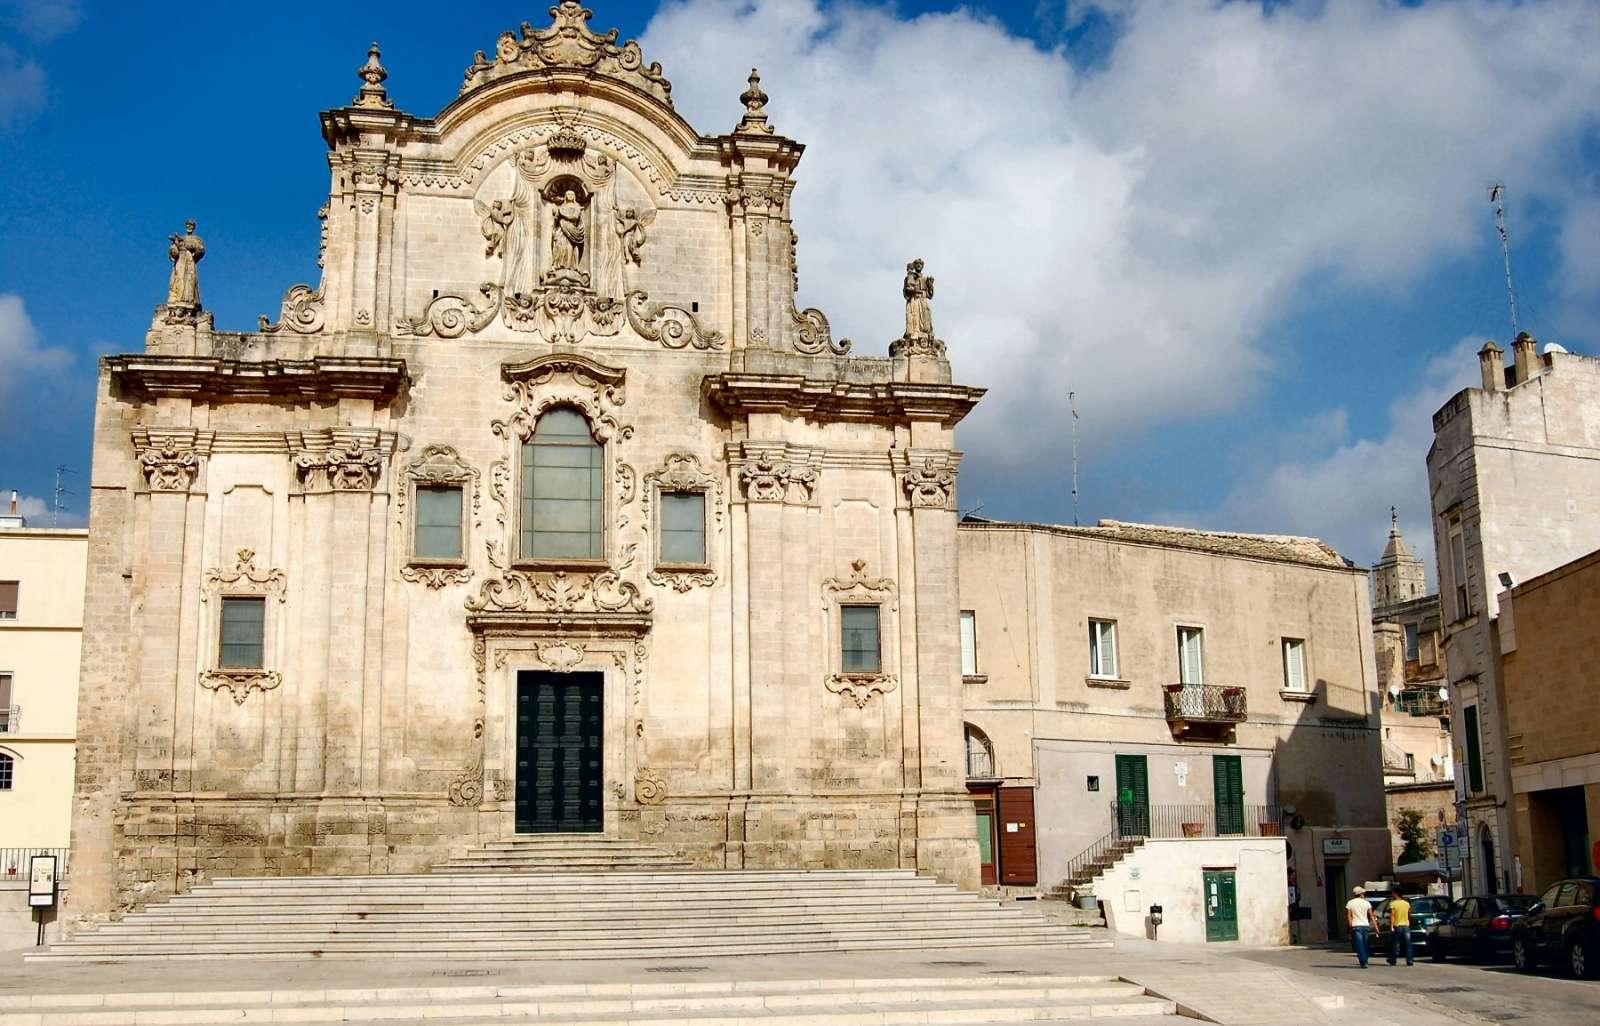 Eine der prächtigen Kirchen. Hier: San Francesco d'Assisi